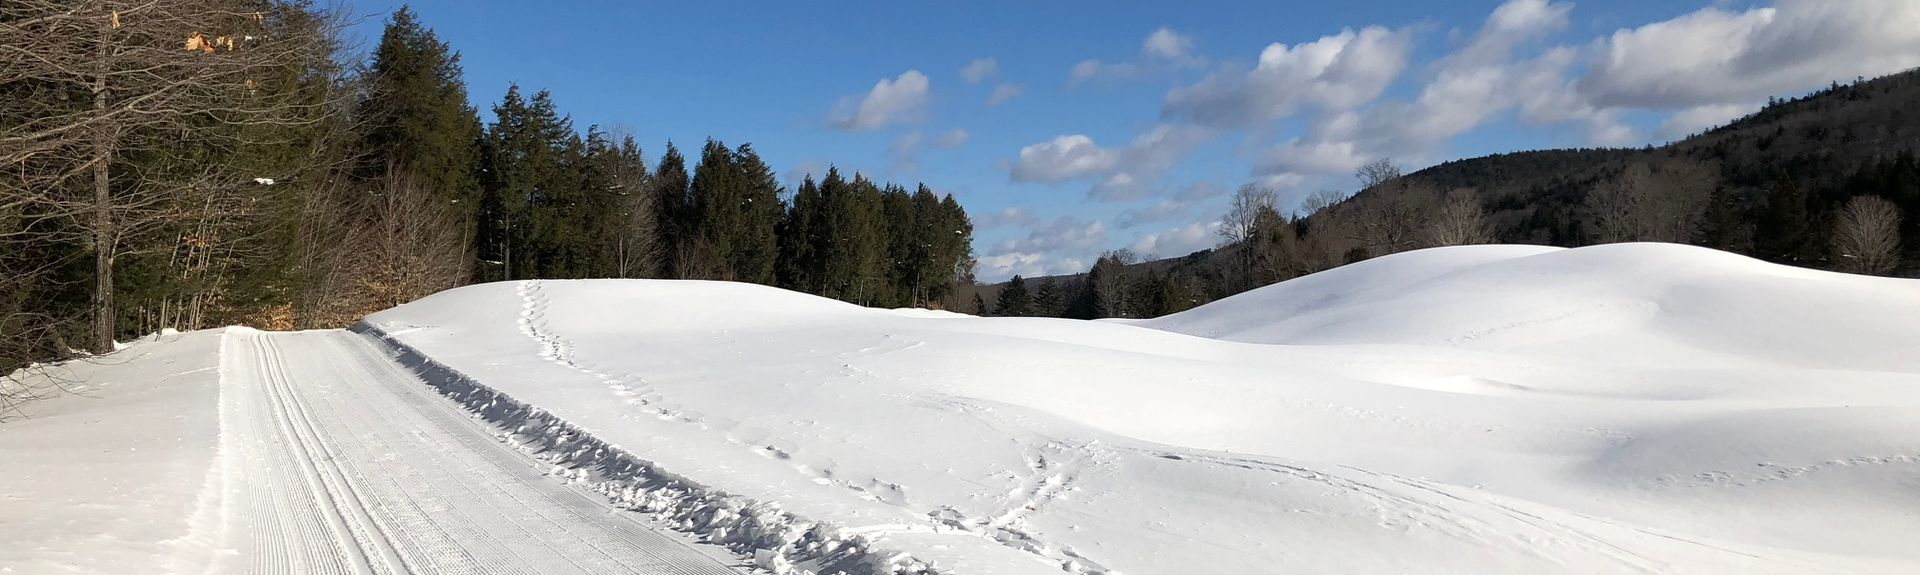 Jackson Gore Ski Resort at Okemo, Ludlow, Vermont, United States of America